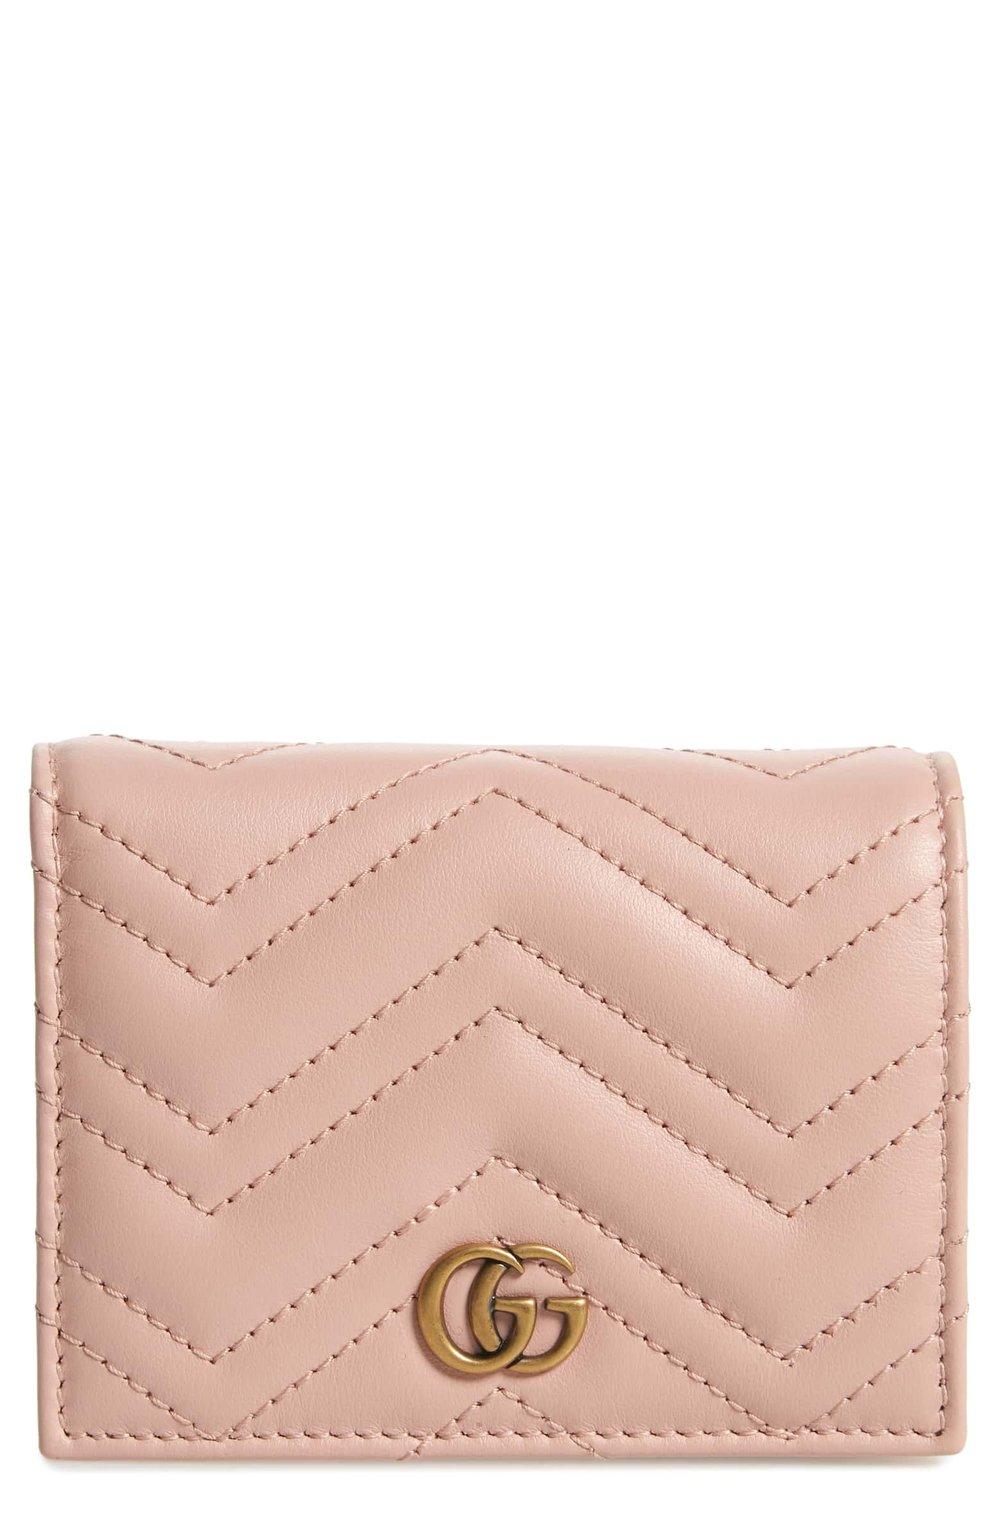 gucci blush leather wallet.jpg